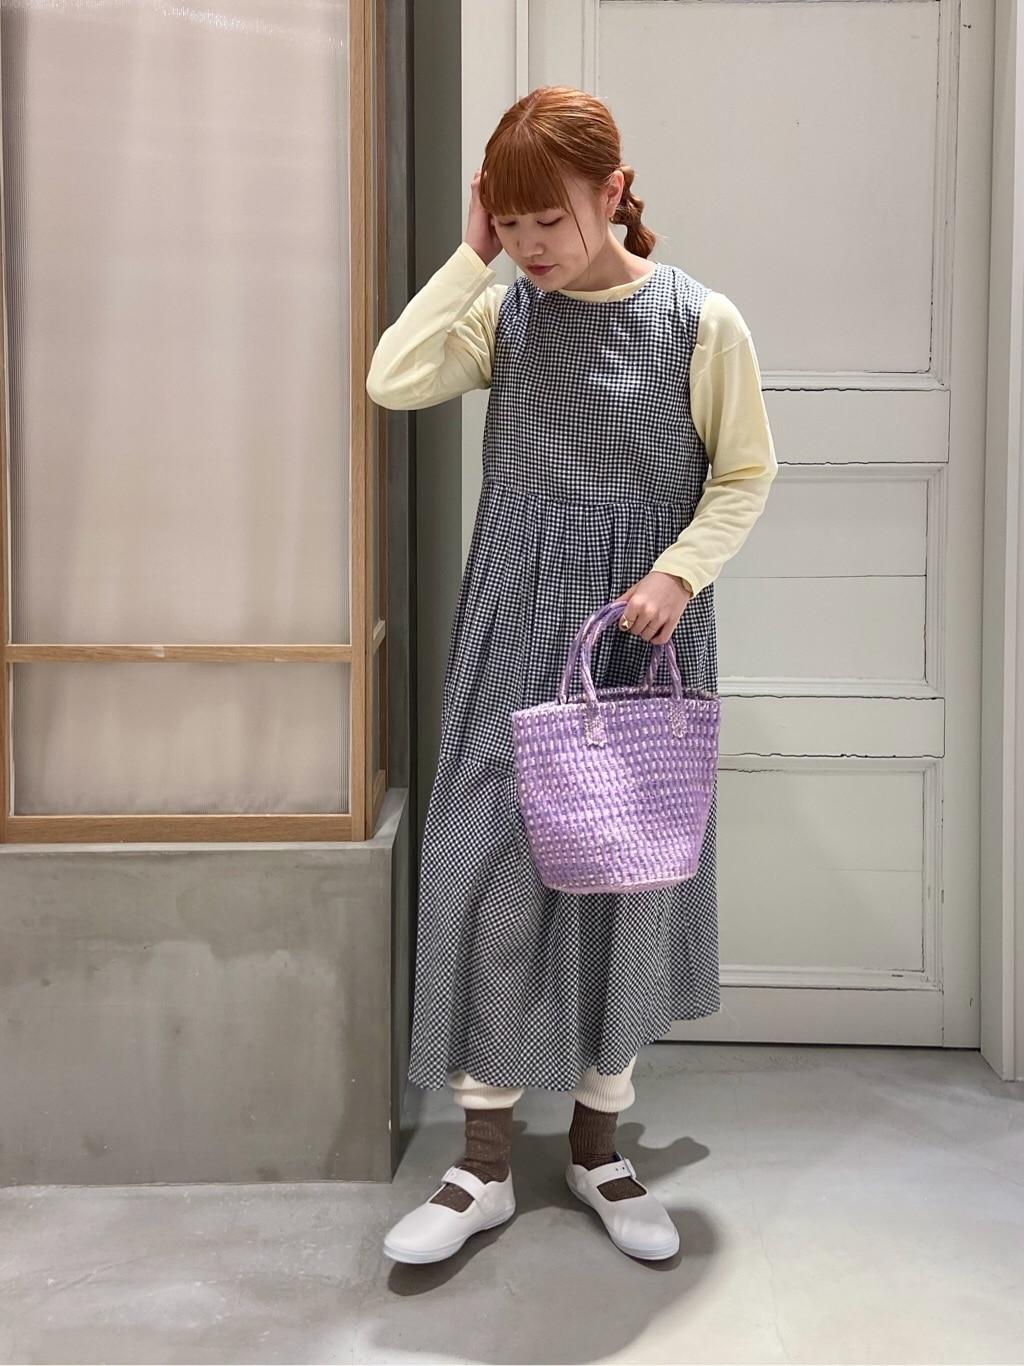 bulle de savon 渋谷スクランブルスクエア 身長:160cm 2021.04.07